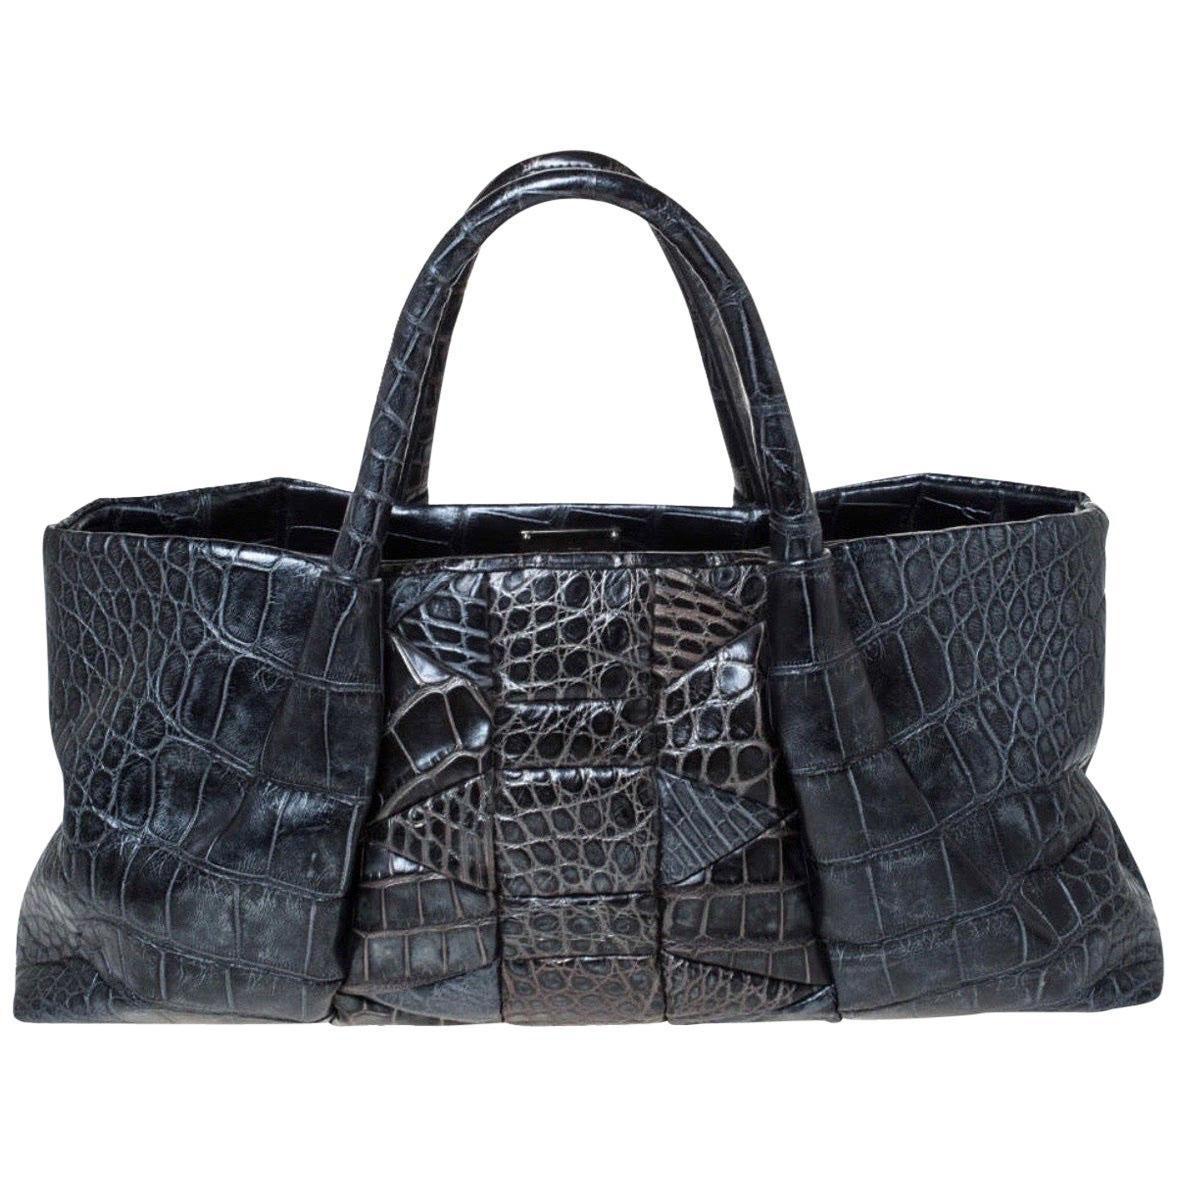 NEW Salvatore Ferragamo Exotic Skin Tote Top Handle Hand Shoulder Bag